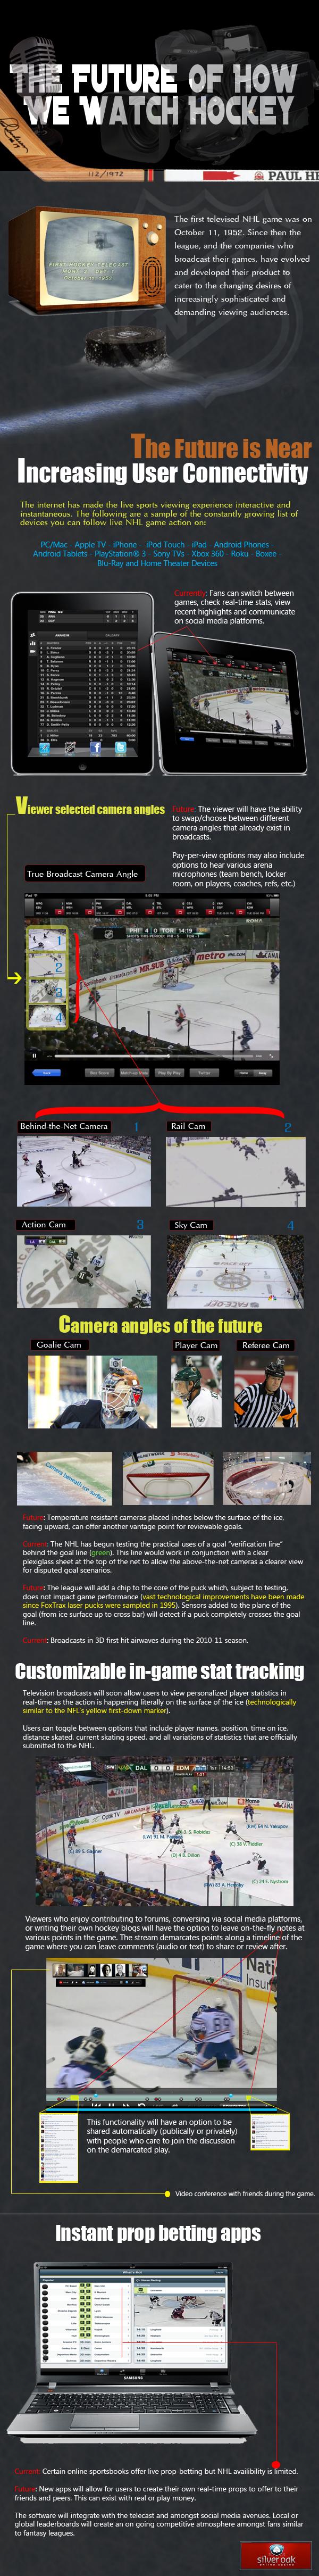 Alternative Ways to Watching Hockey